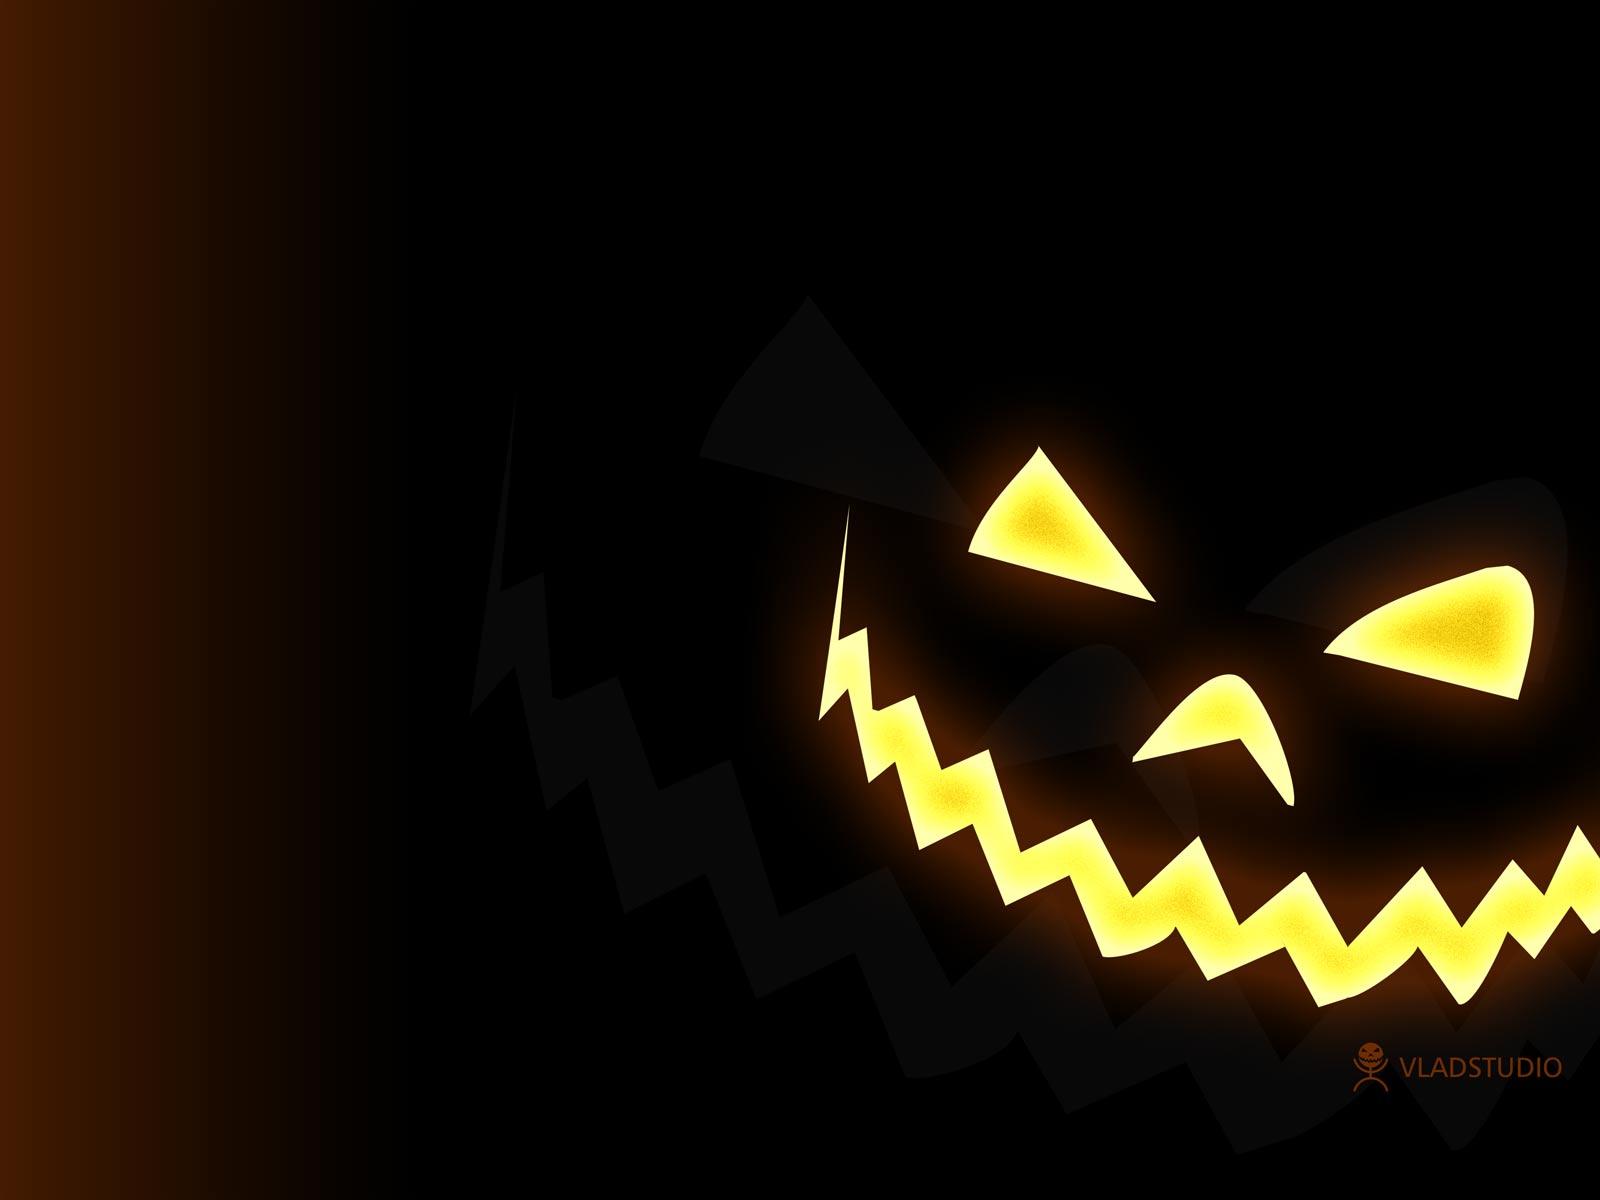 http://1.bp.blogspot.com/_zqiGggaZKM8/TNAjJeHR_GI/AAAAAAAAAB4/uZ19-rCCTmY/s1600/halloween_wallpaper.jpg